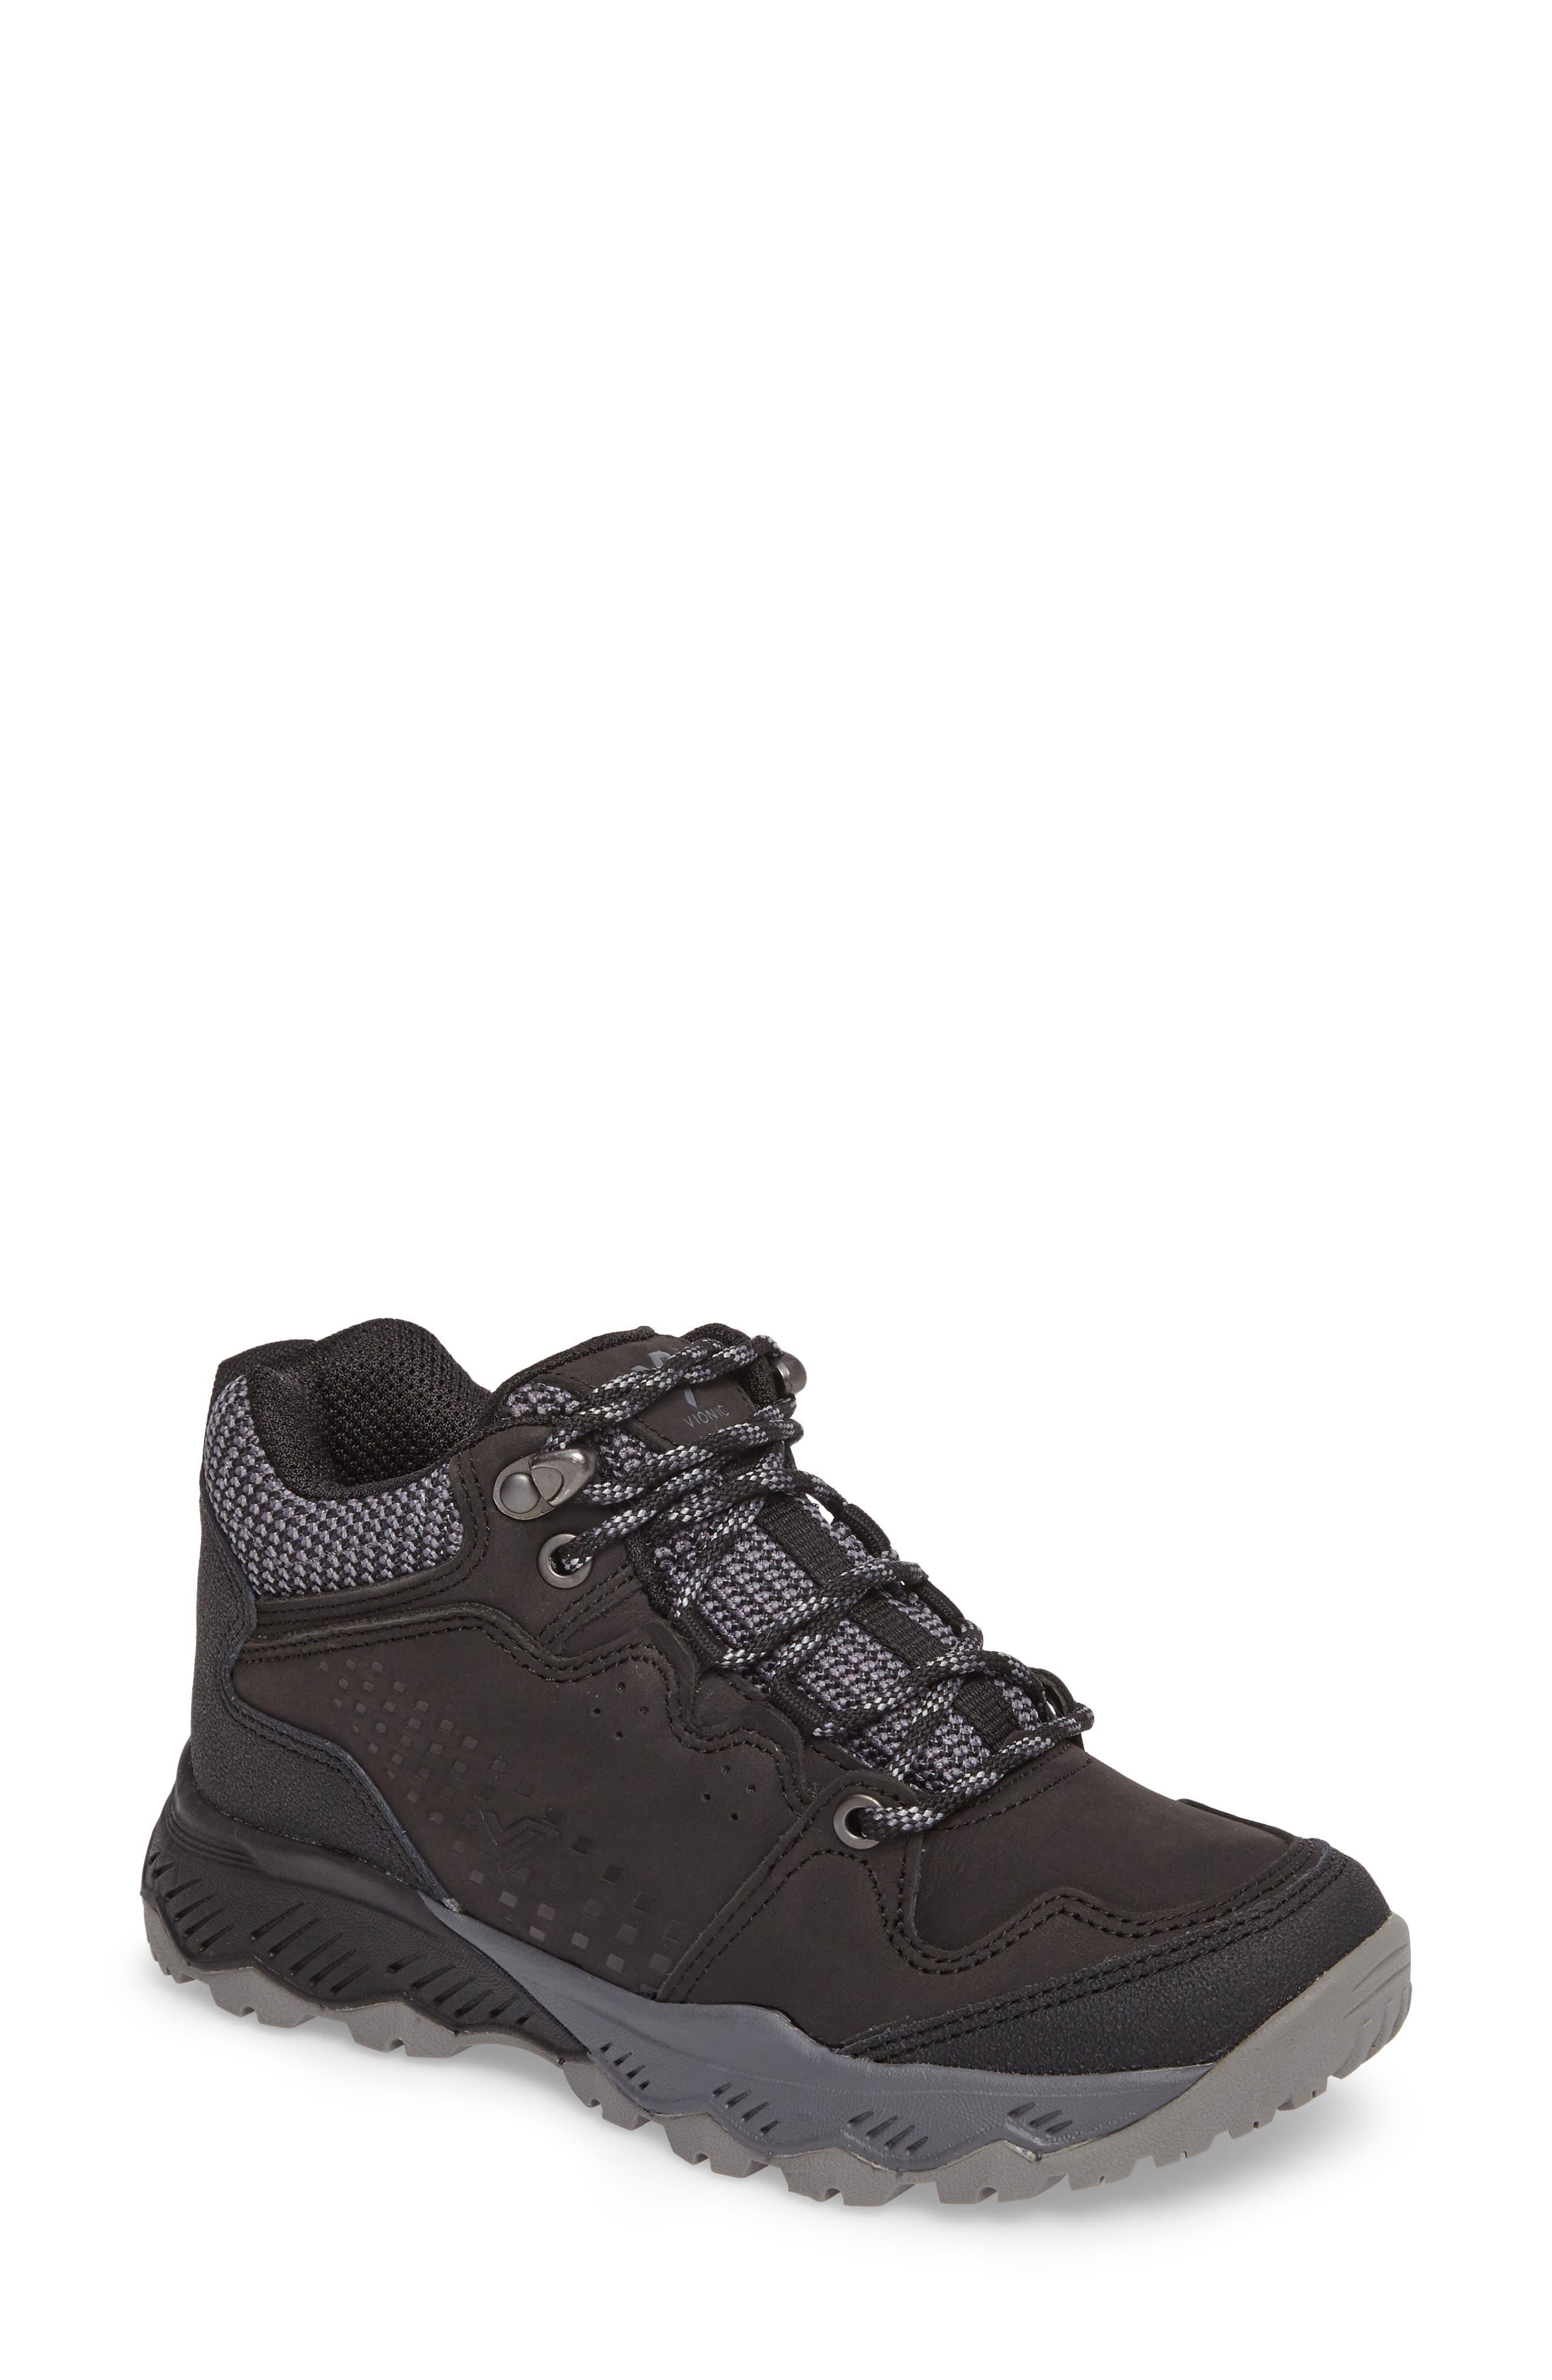 Alternate Image 1 Selected - Vionic Everett Hiking Shoe (Women)